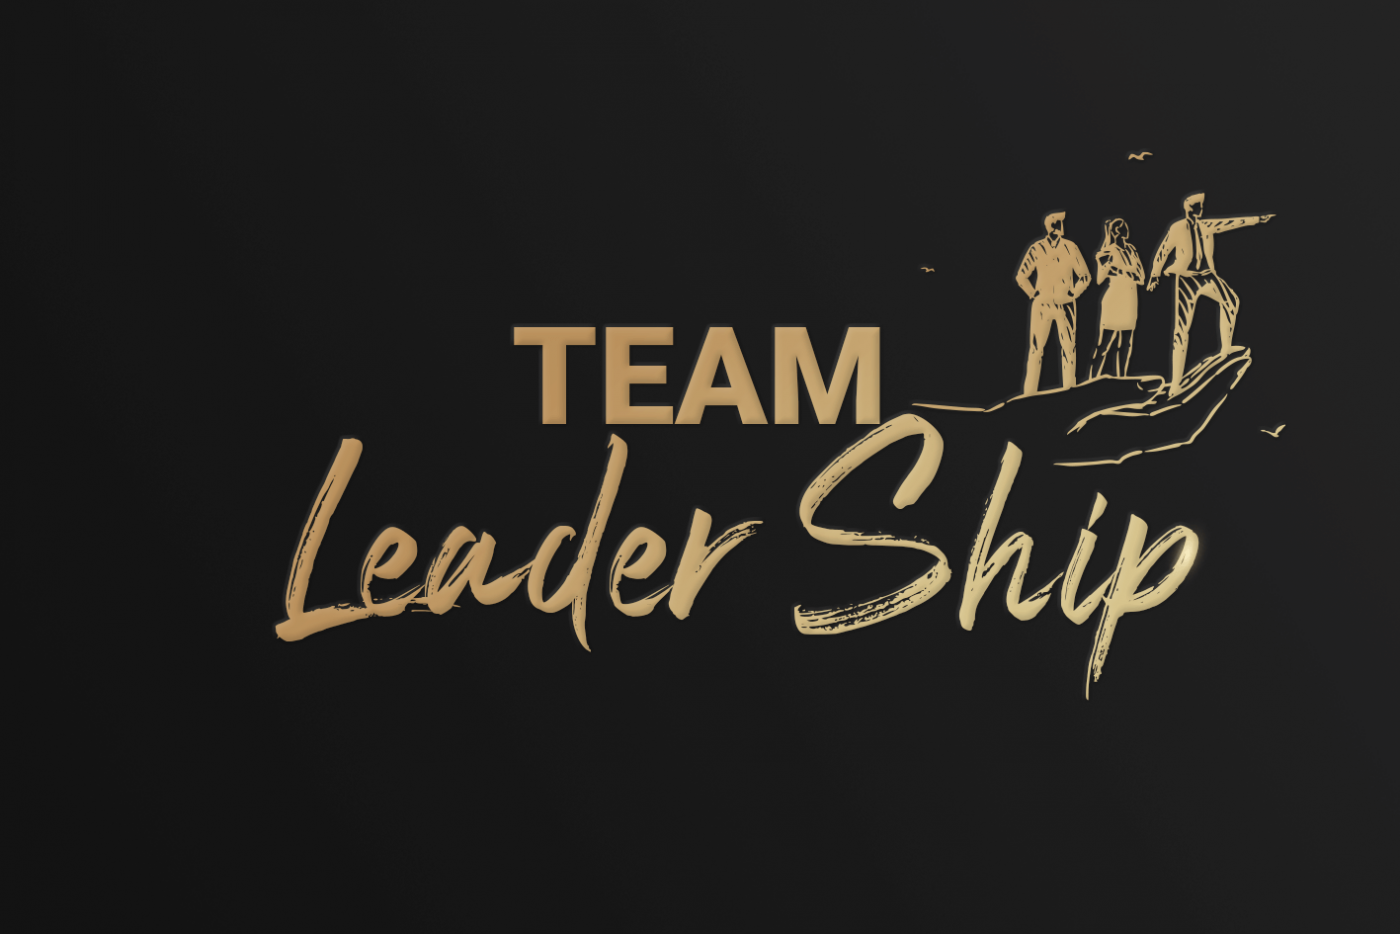 Kachel Abteilung Leader Ship 1400x934 - Karriere